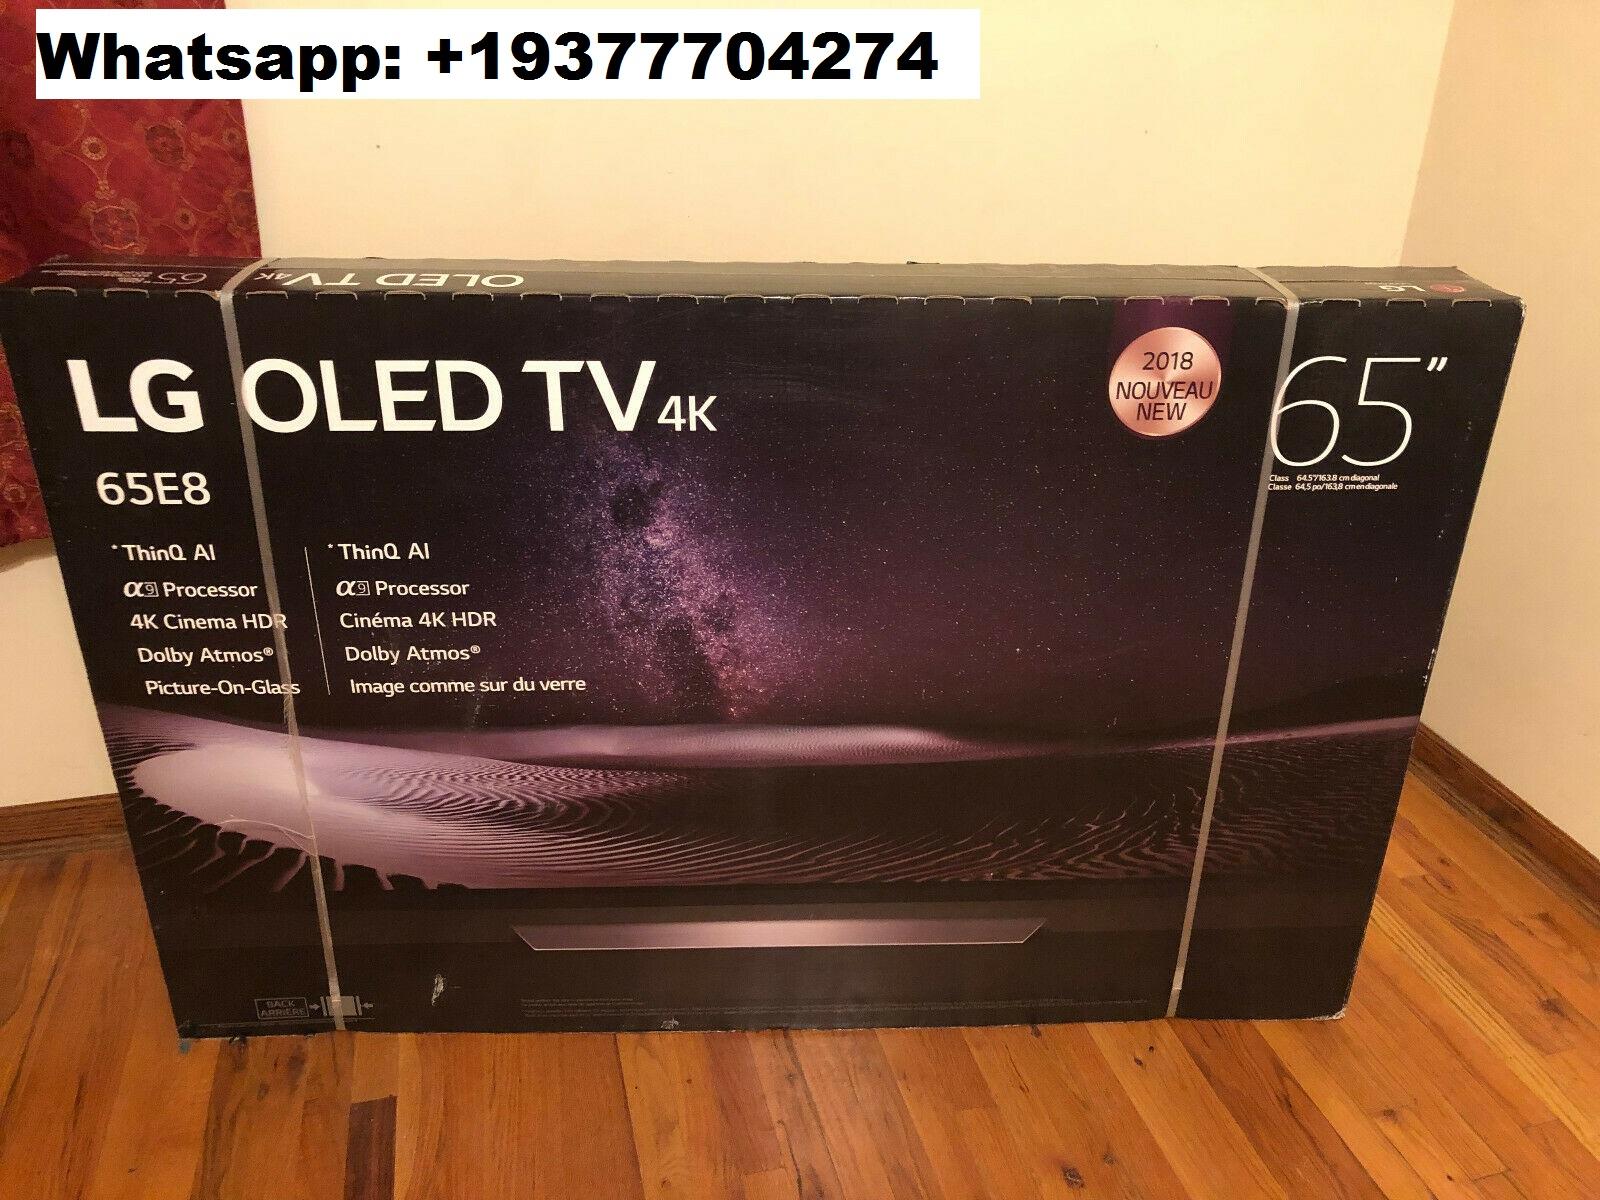 "SÉRIE LG E8PUA THINQ OLED65E8PUA TV SMART OLED de 65 ""4K ULTRA HD NOVO NA FÁBRICA"